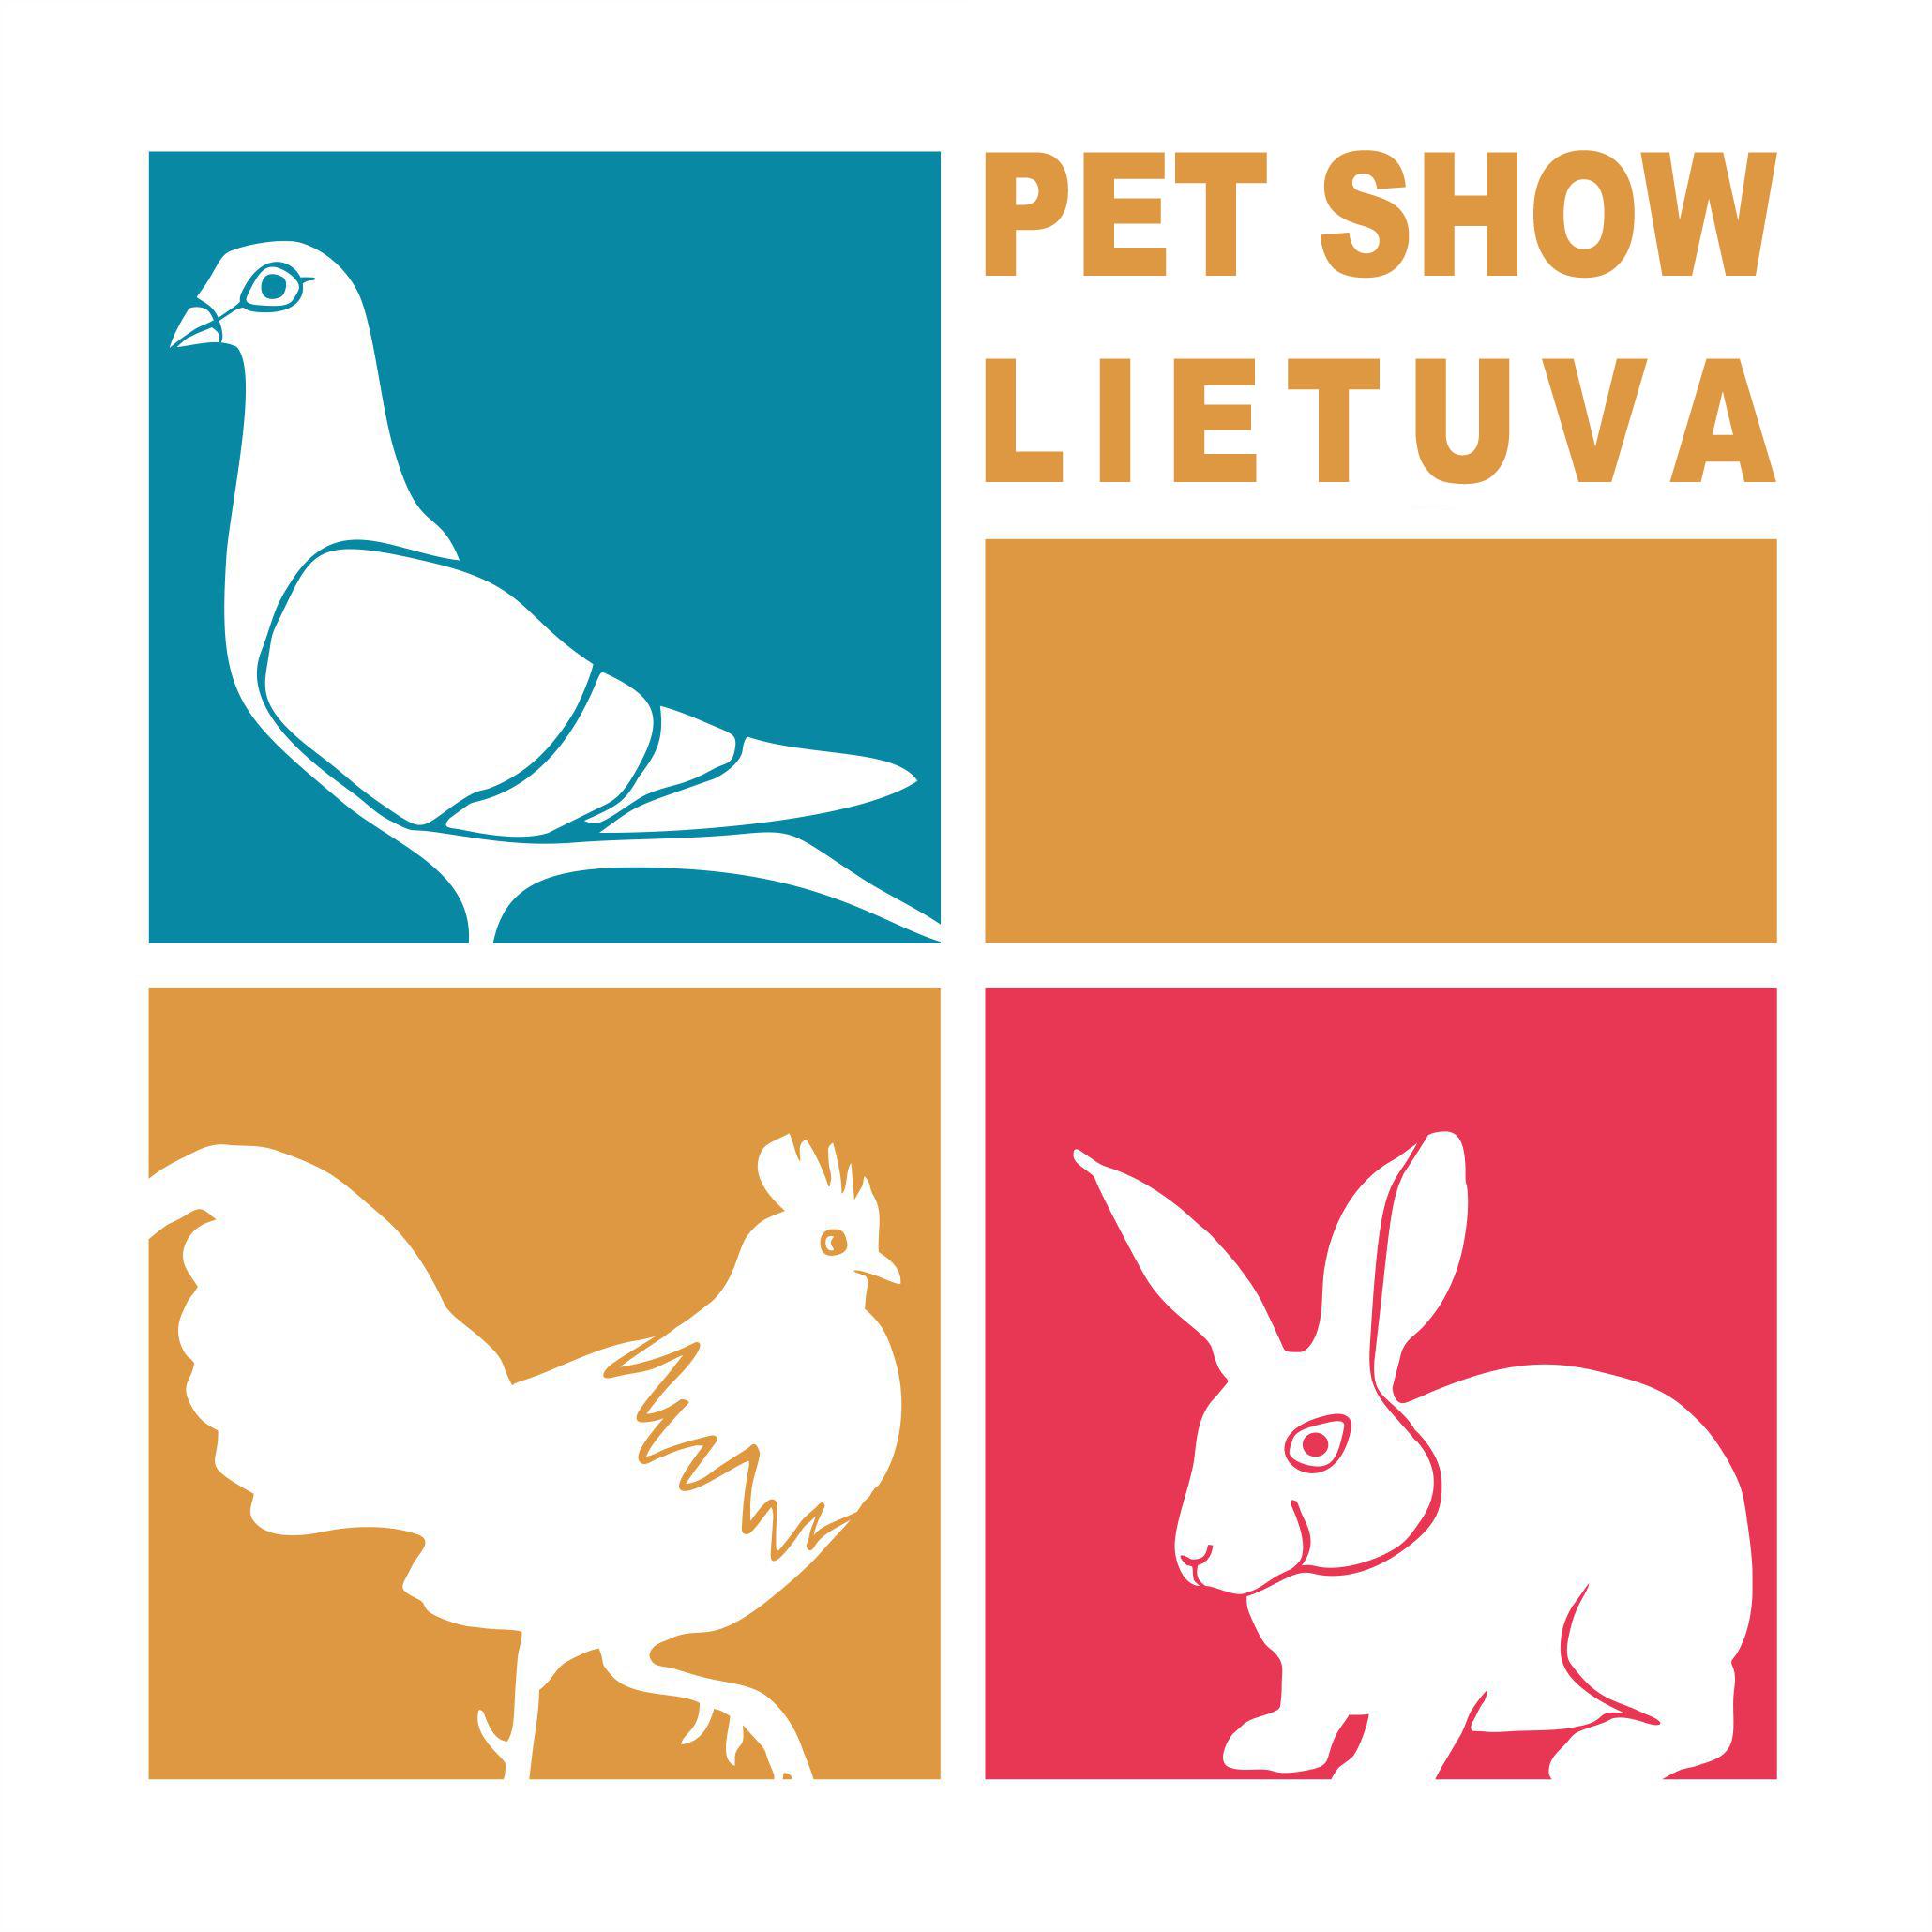 """PET SHOW LIETUVA"" PARODOS NUOTRAUKOS"